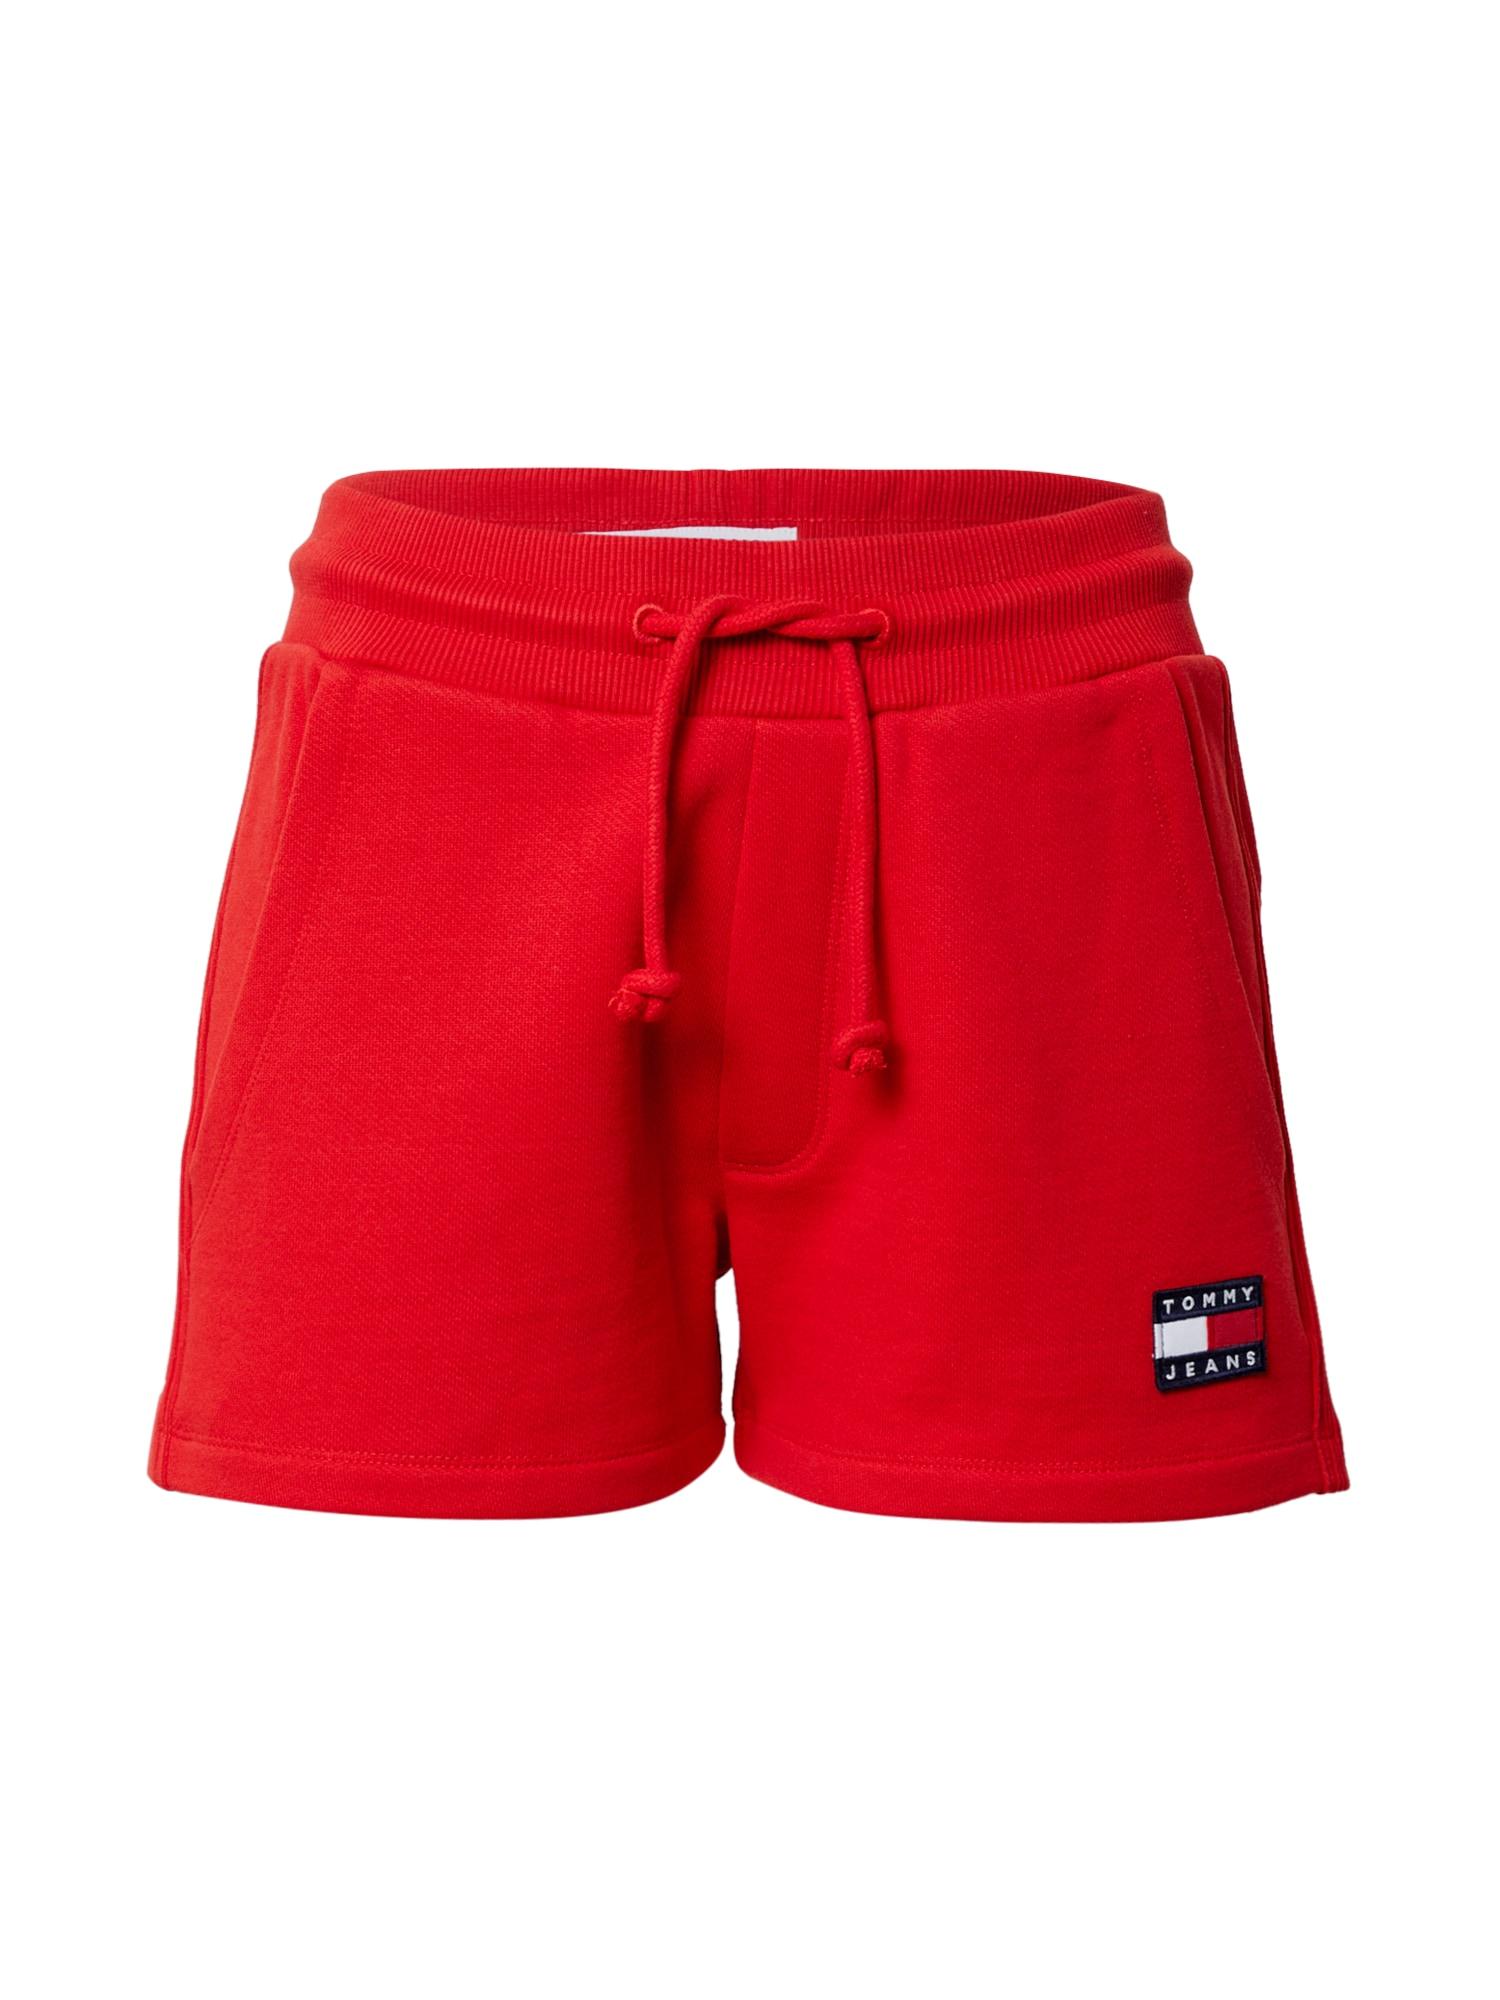 Tommy Jeans Kelnės raudona